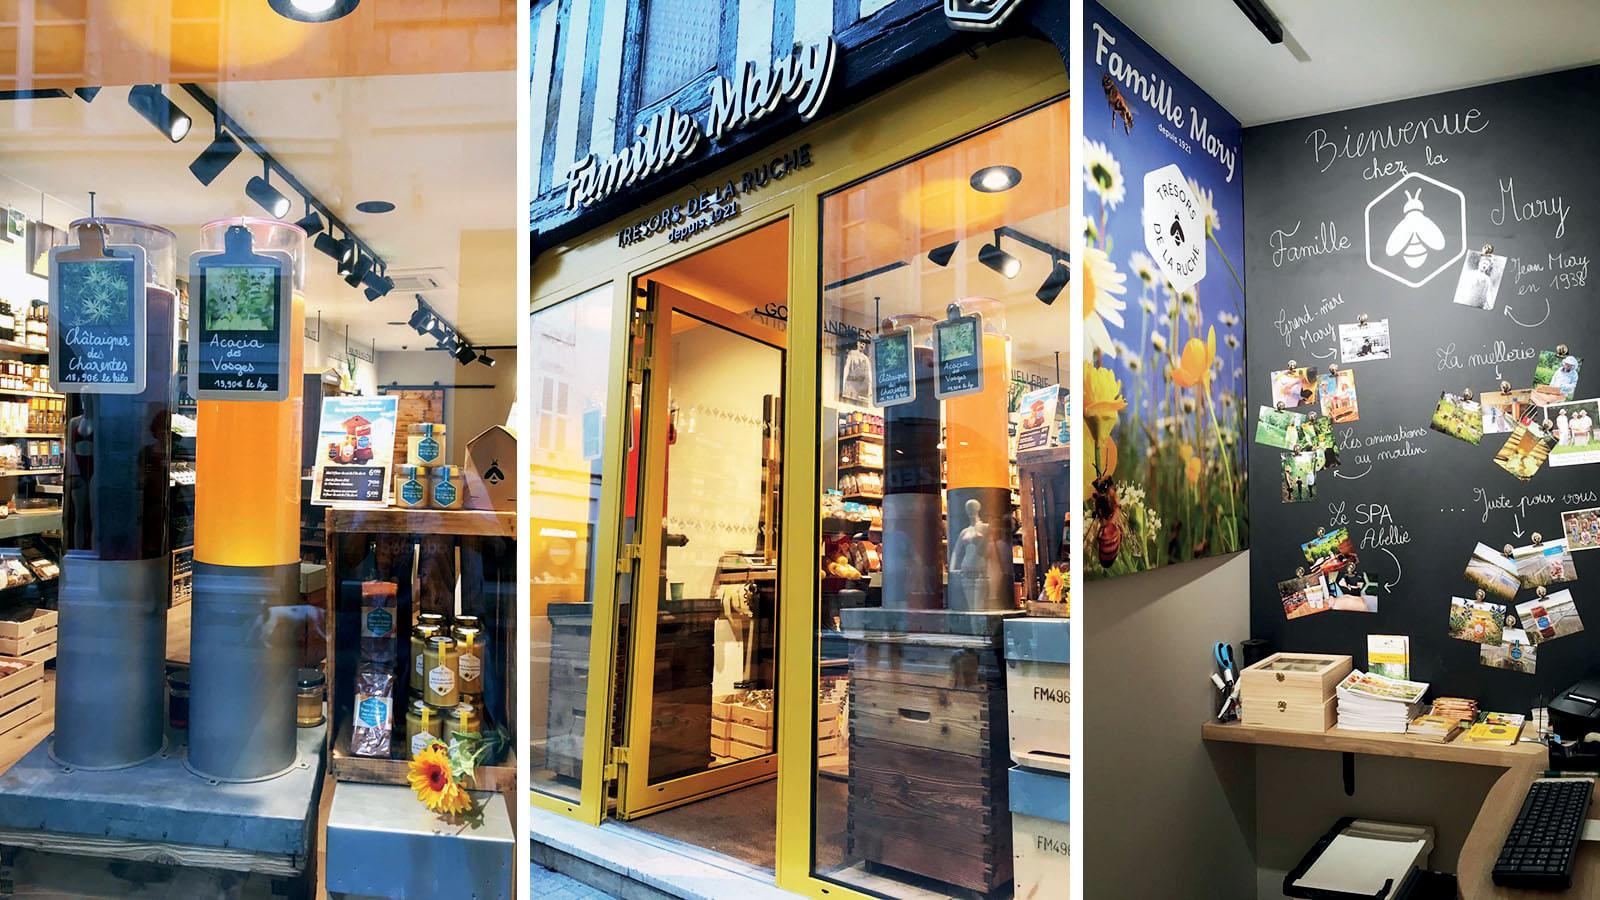 EFI Design Boutique Famille Mary Efi Design 1 878